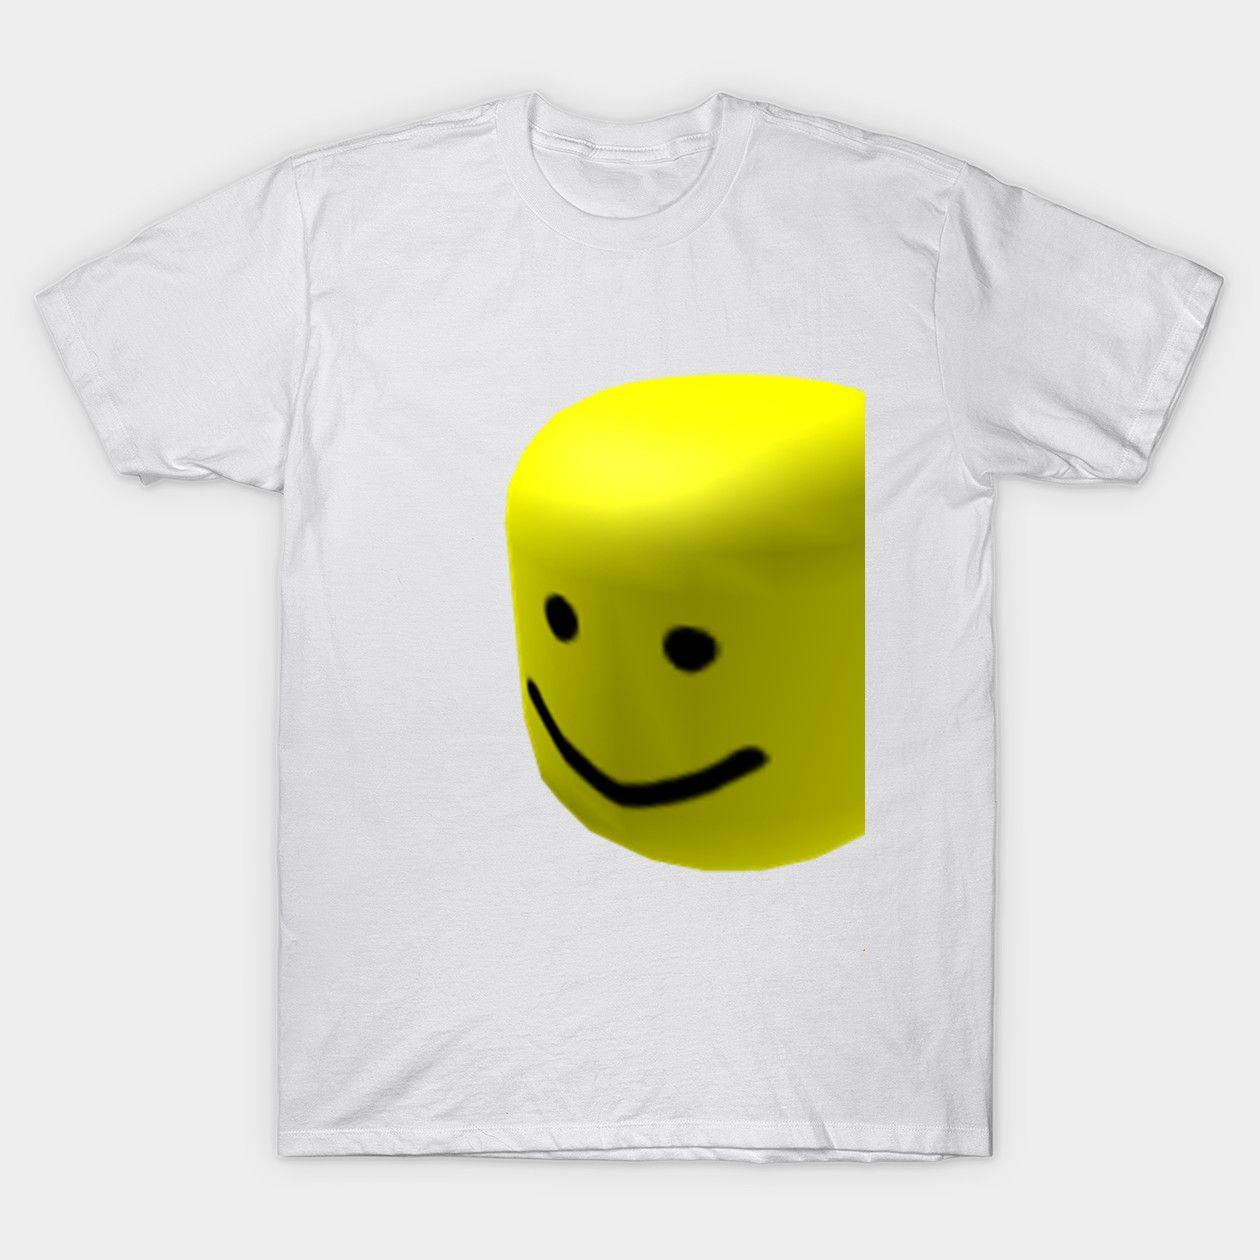 Roblox Oof Roblox Meme Classic T Shirt Classic T Shirts